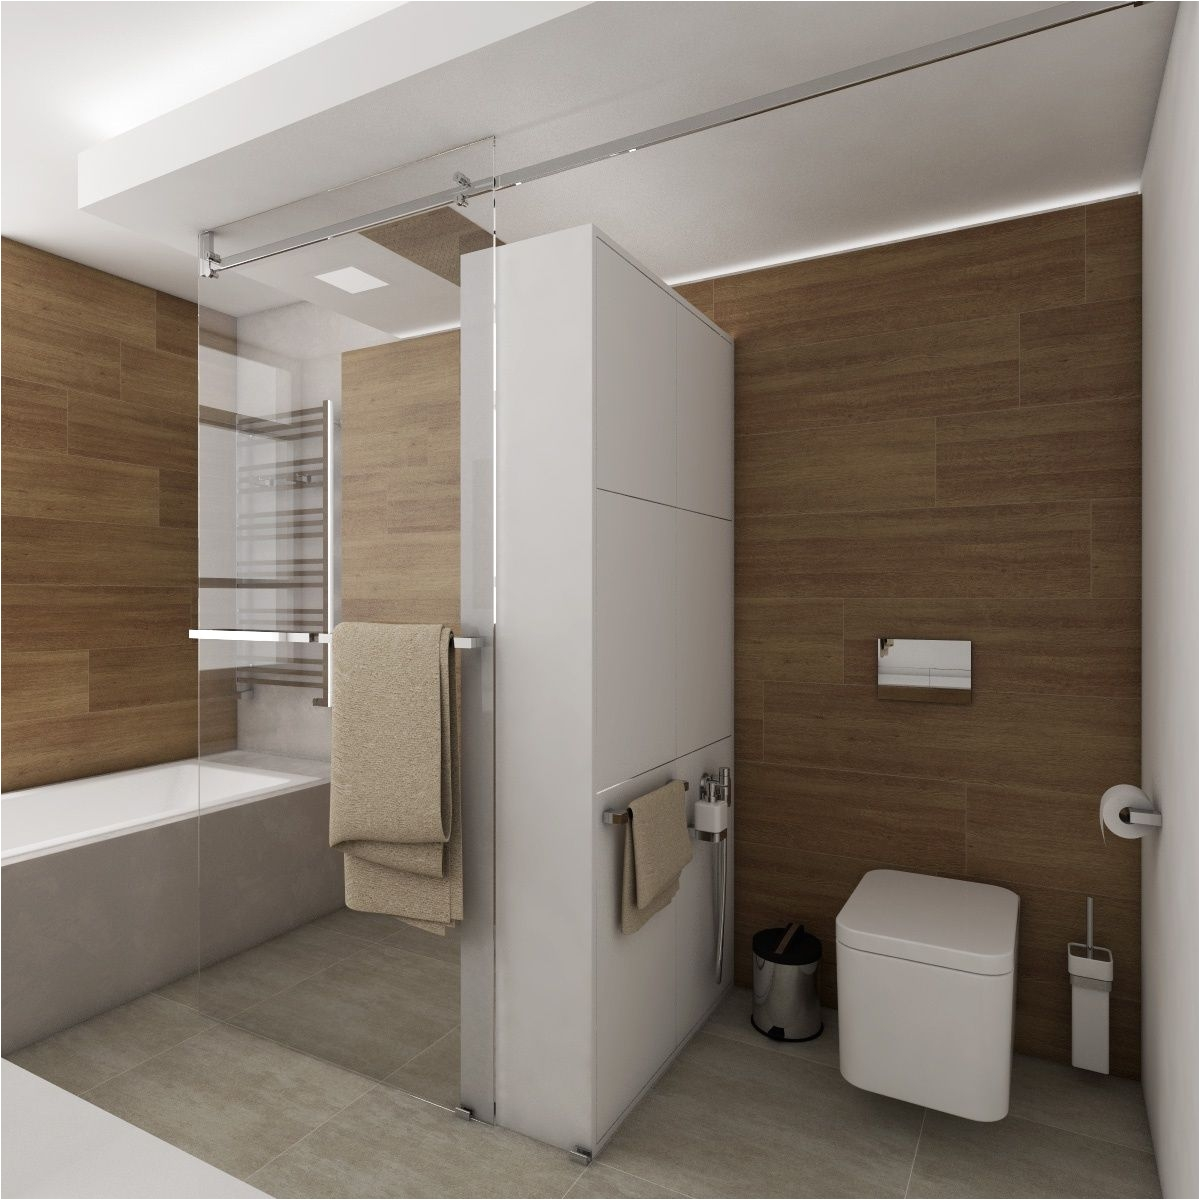 Luxusn koupelna BEIGE DELUXE Pohled od umyvadla